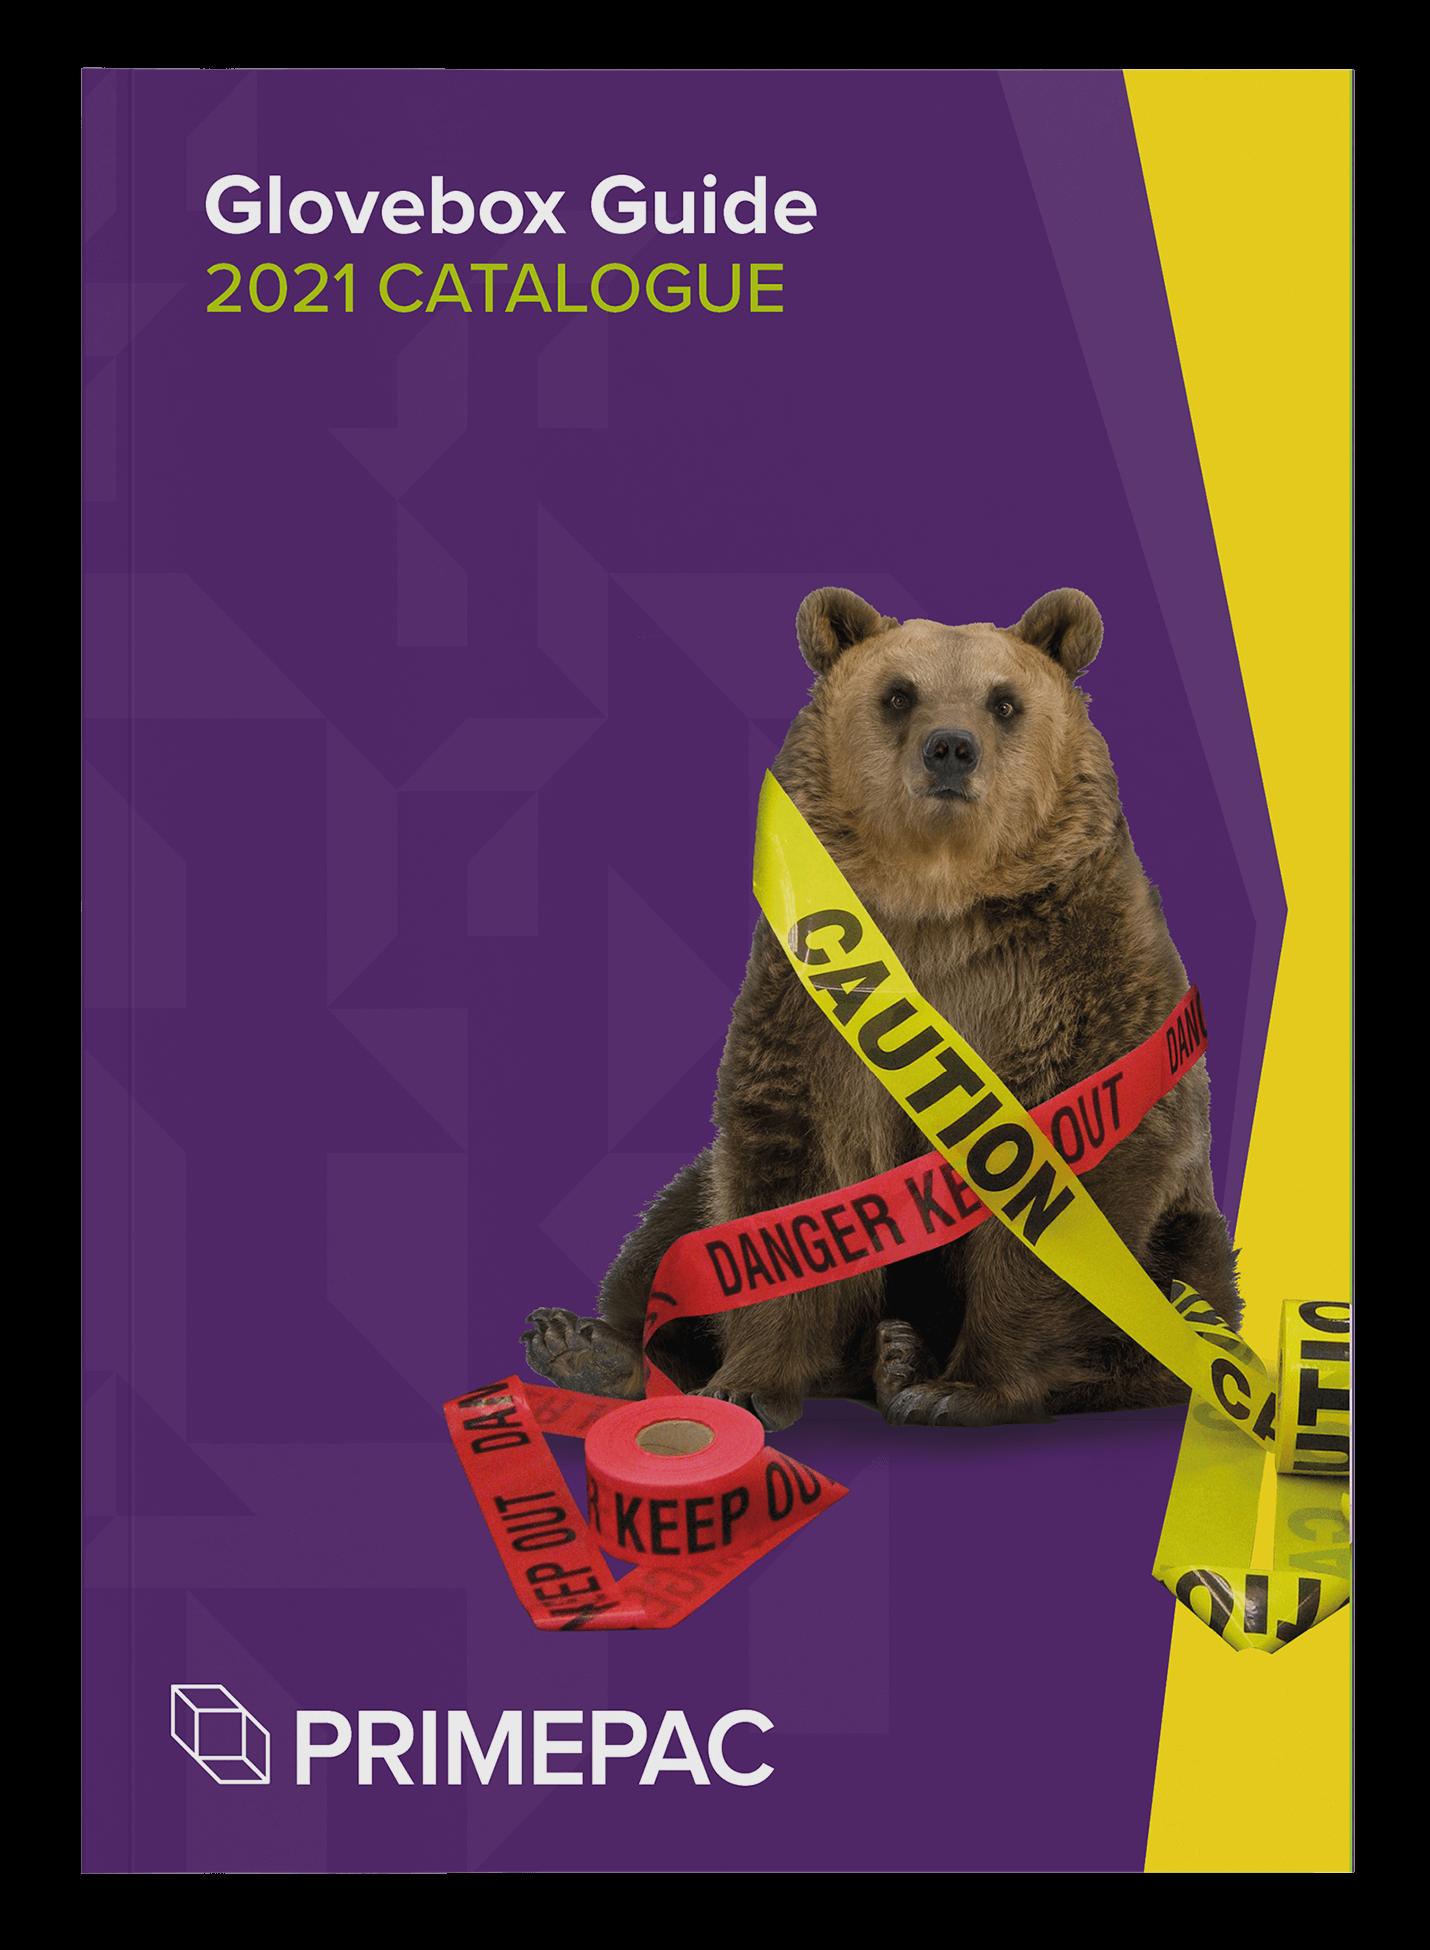 Glovebox guide catalogue